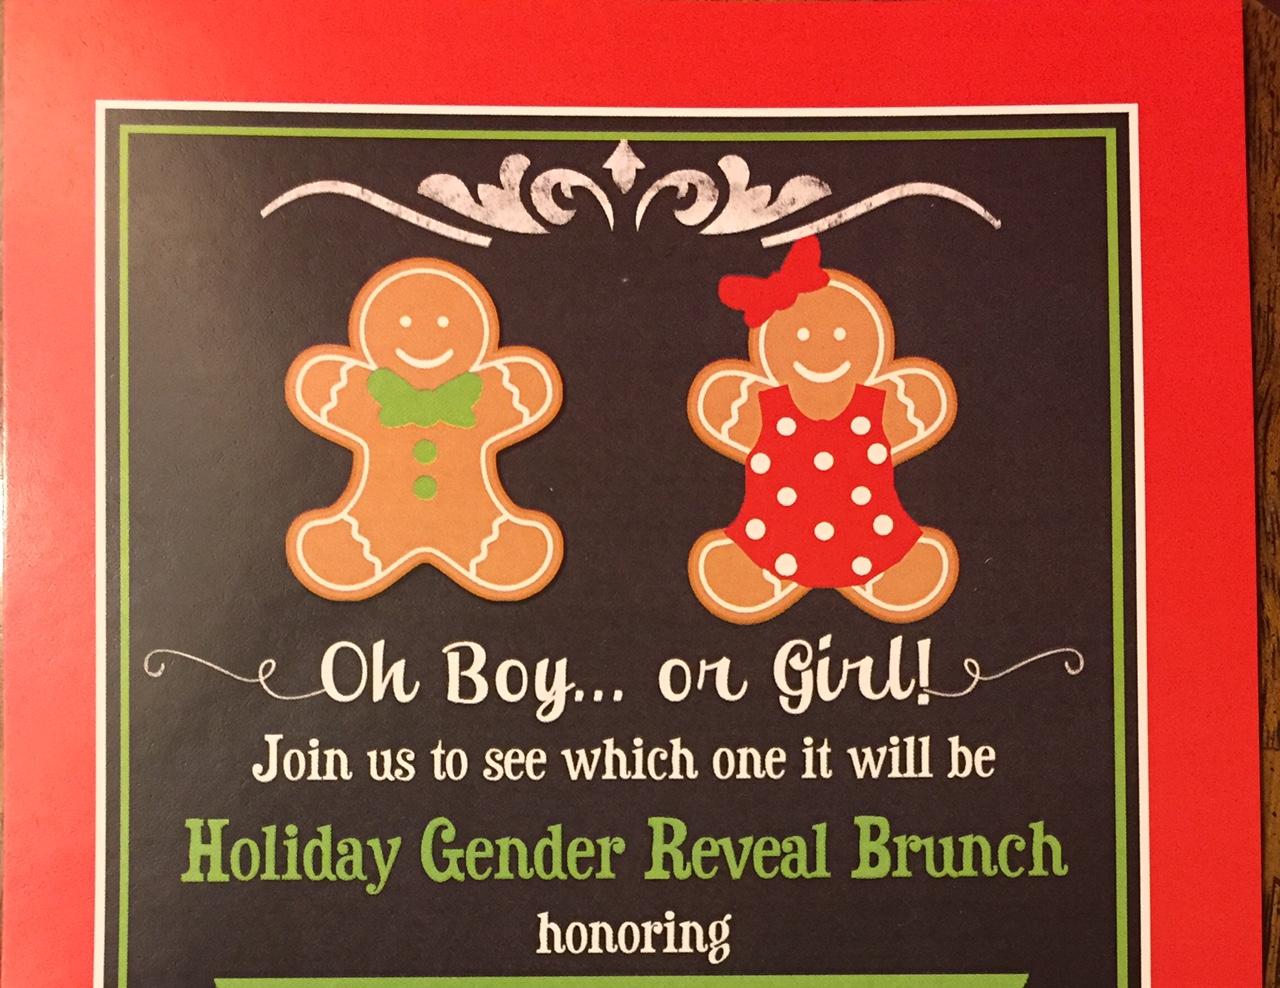 Christmas Gender Reveal Theme.La Bella Vita Event Company The Beautiful Life January 2016